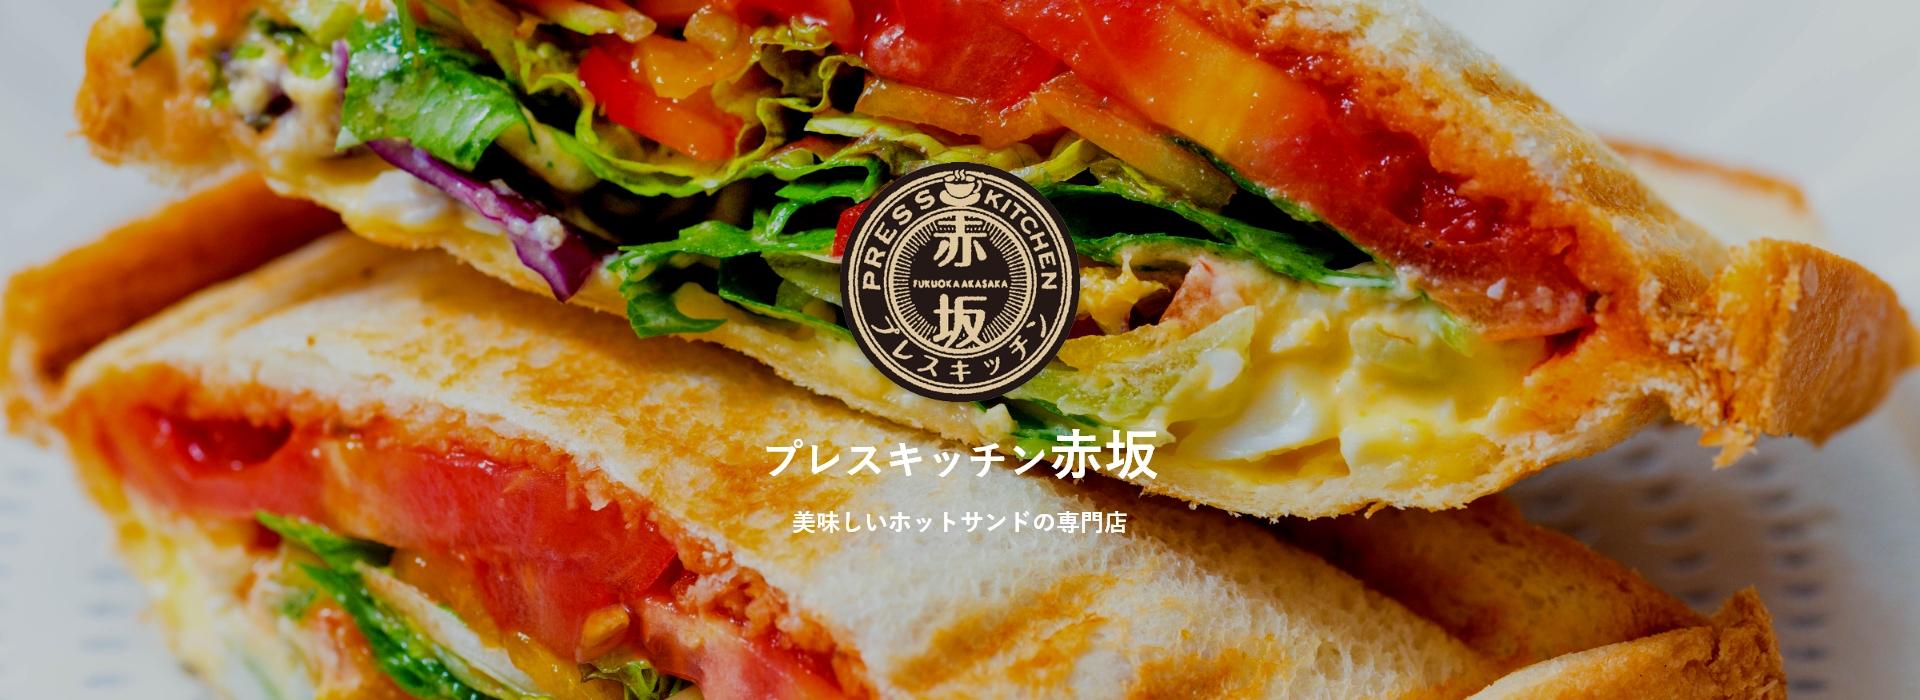 Toasted Sandwich 美味しいホットサンドの専門店